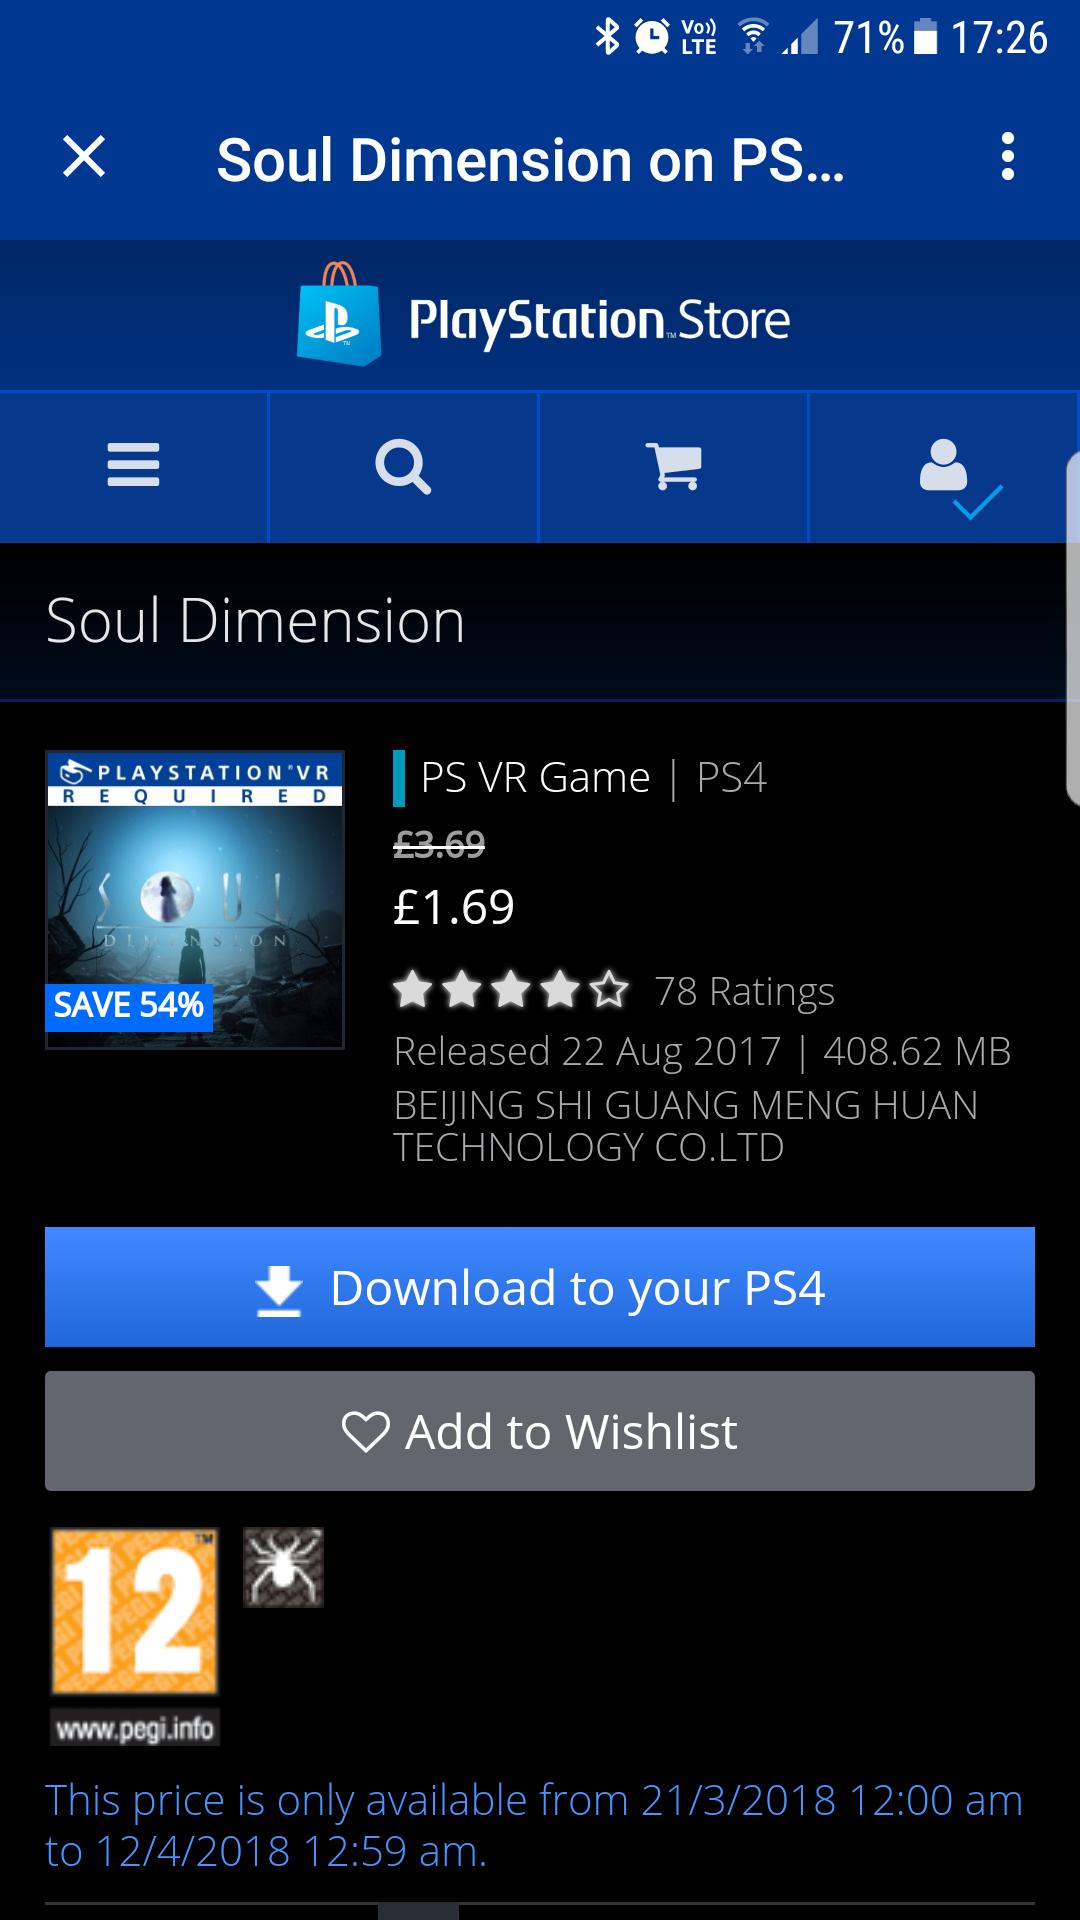 Soul dimensions Psvr - £1.69 @ PSN